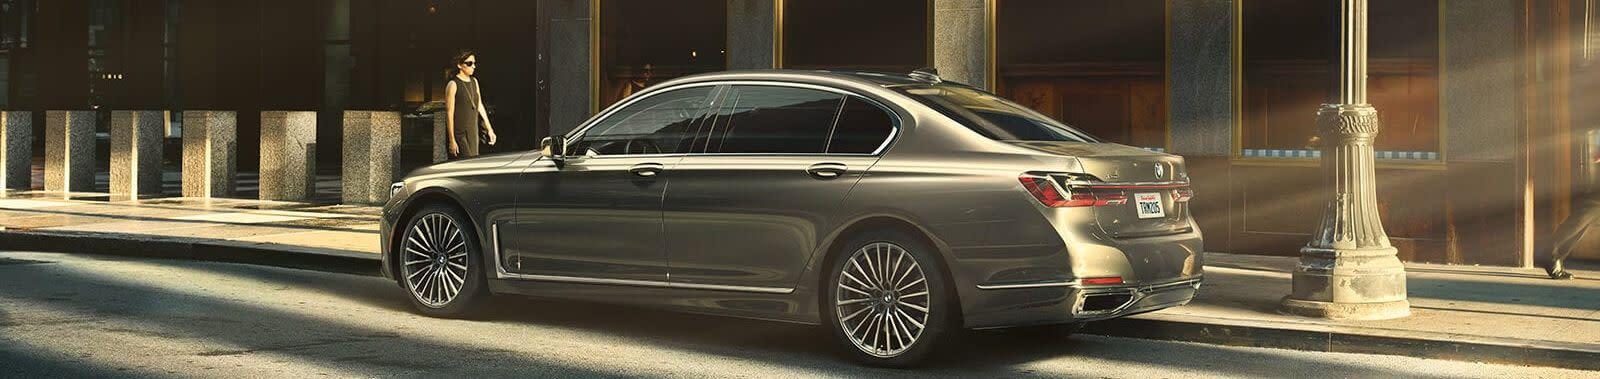 2020 BMW 7 Series Financing near Carrollton, TX